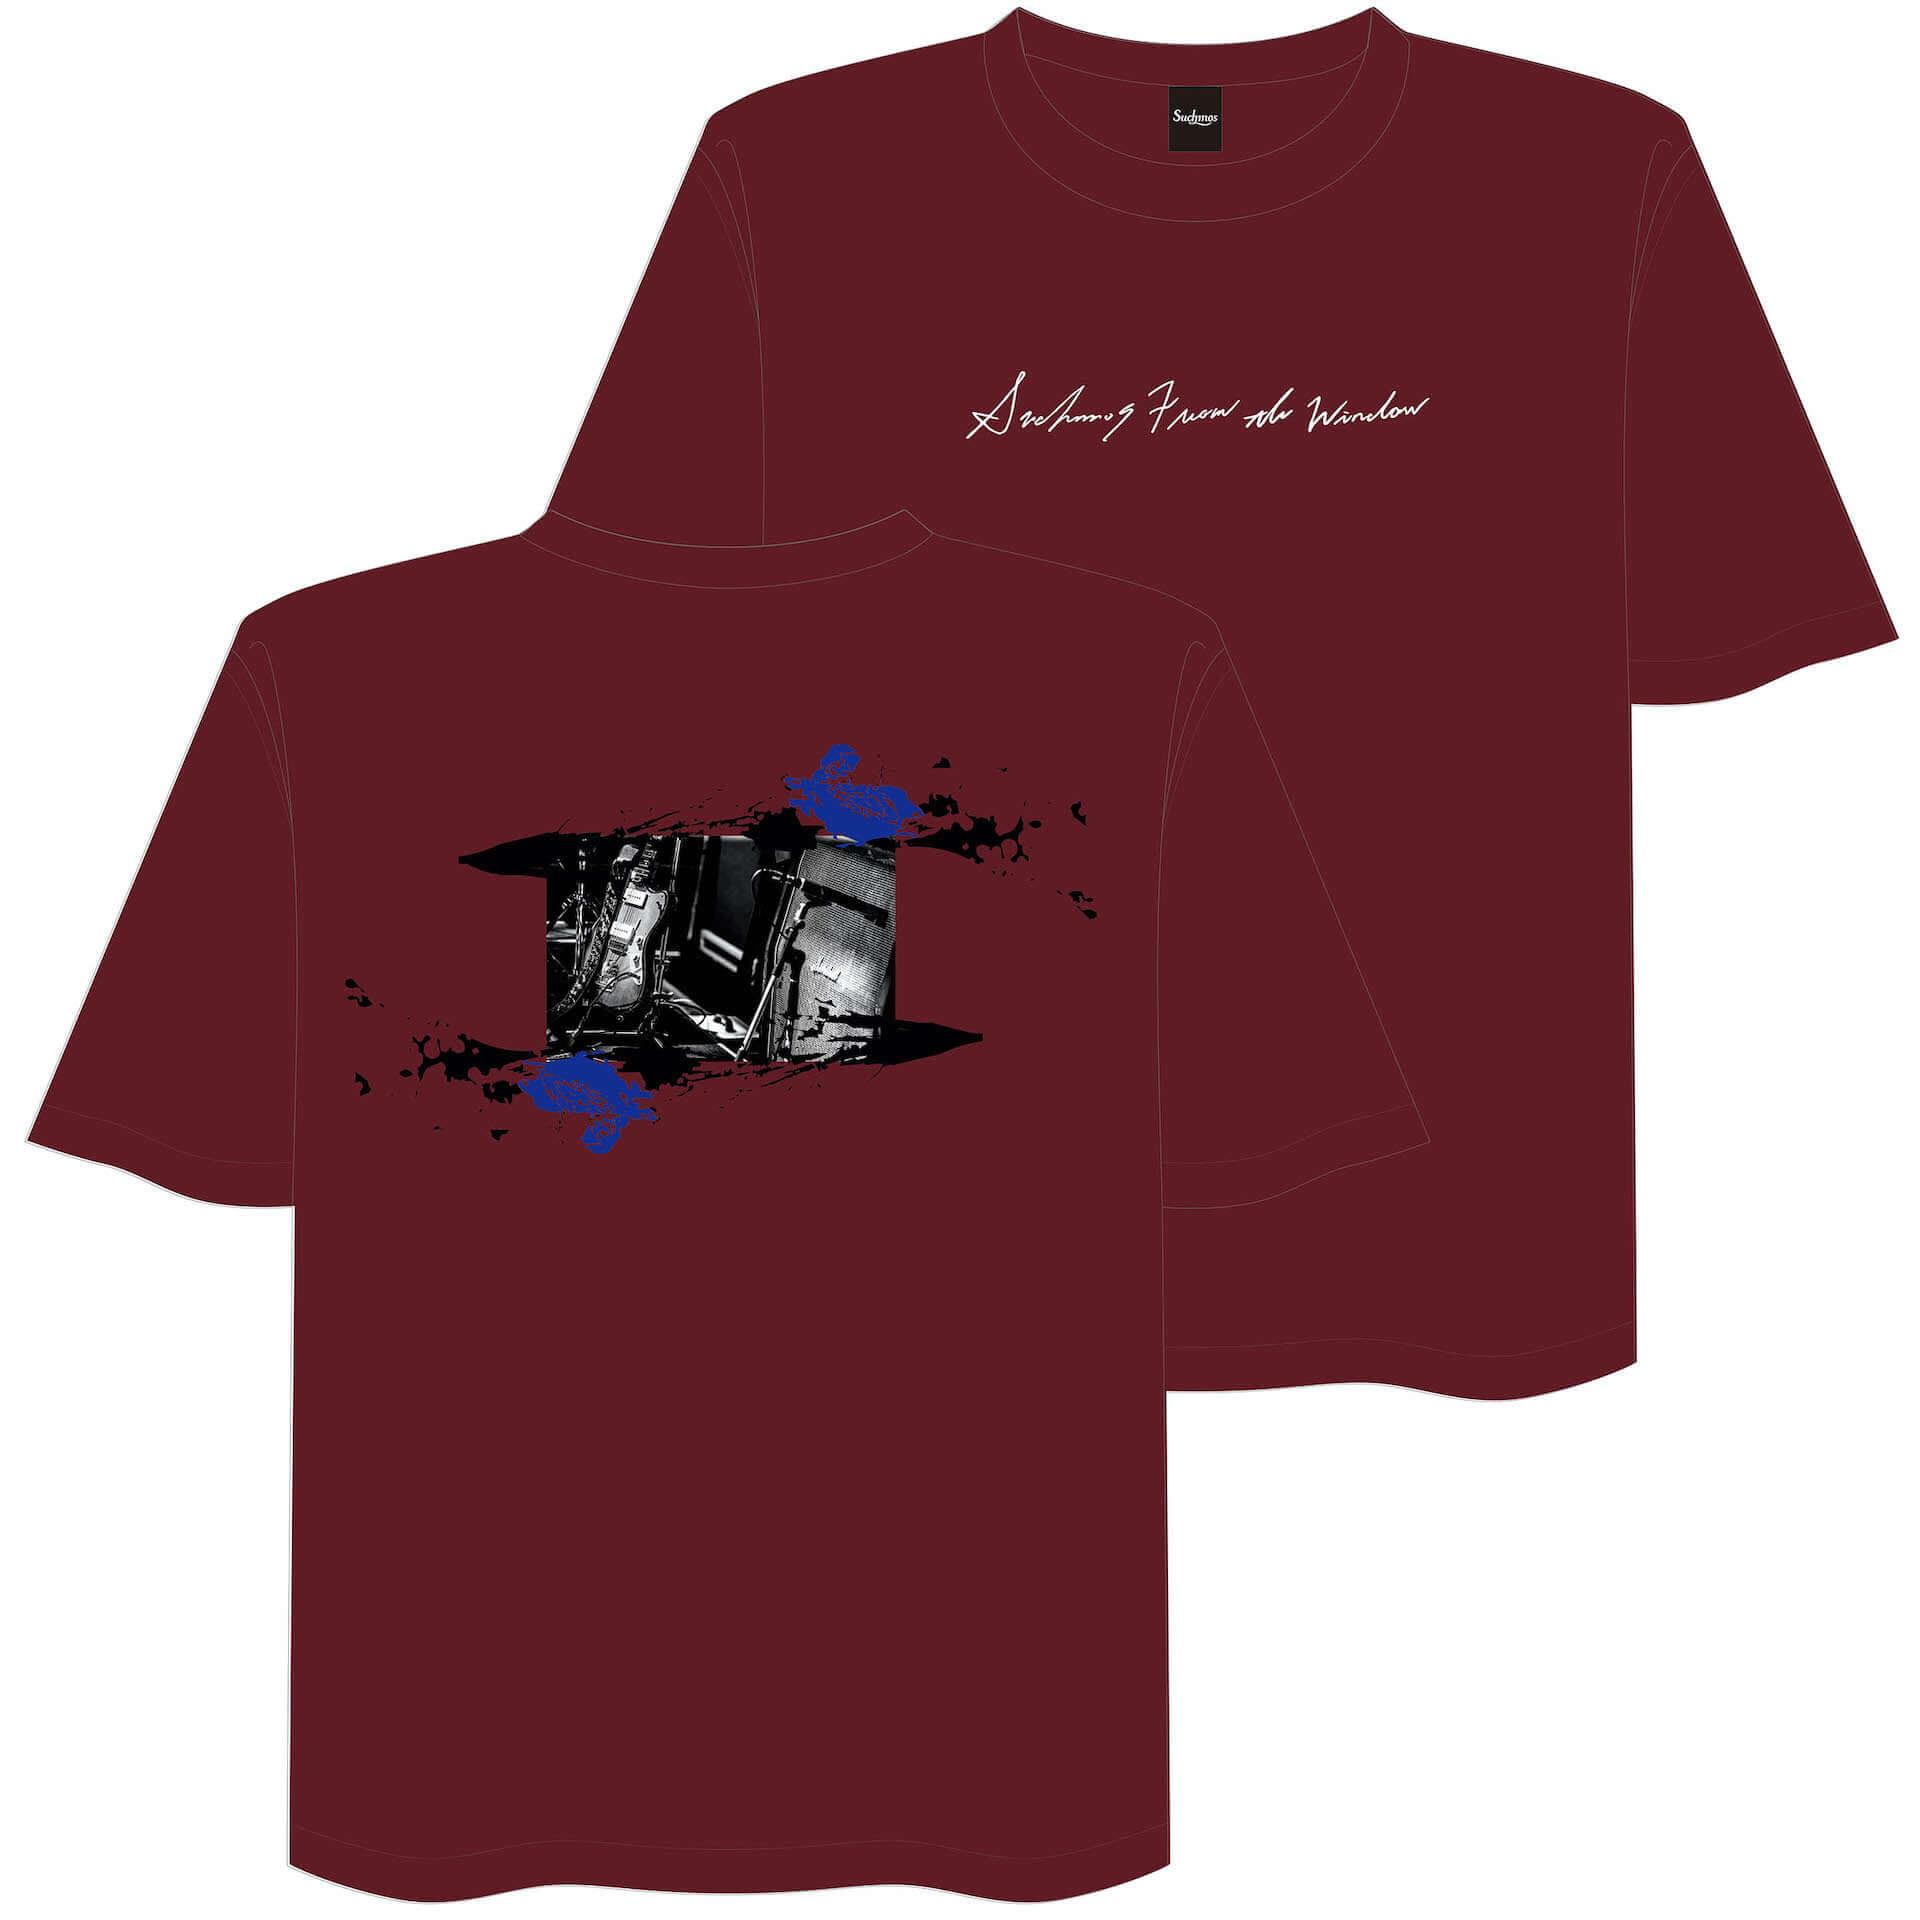 SuchmosのKCEE、TAIHEIがデザインした新作Tシャツが販売決定|LIVEWIRE出演記念&バンド初の受注生産グッズとしてリリース music200715_livewire-suchmos_4-1920x1920